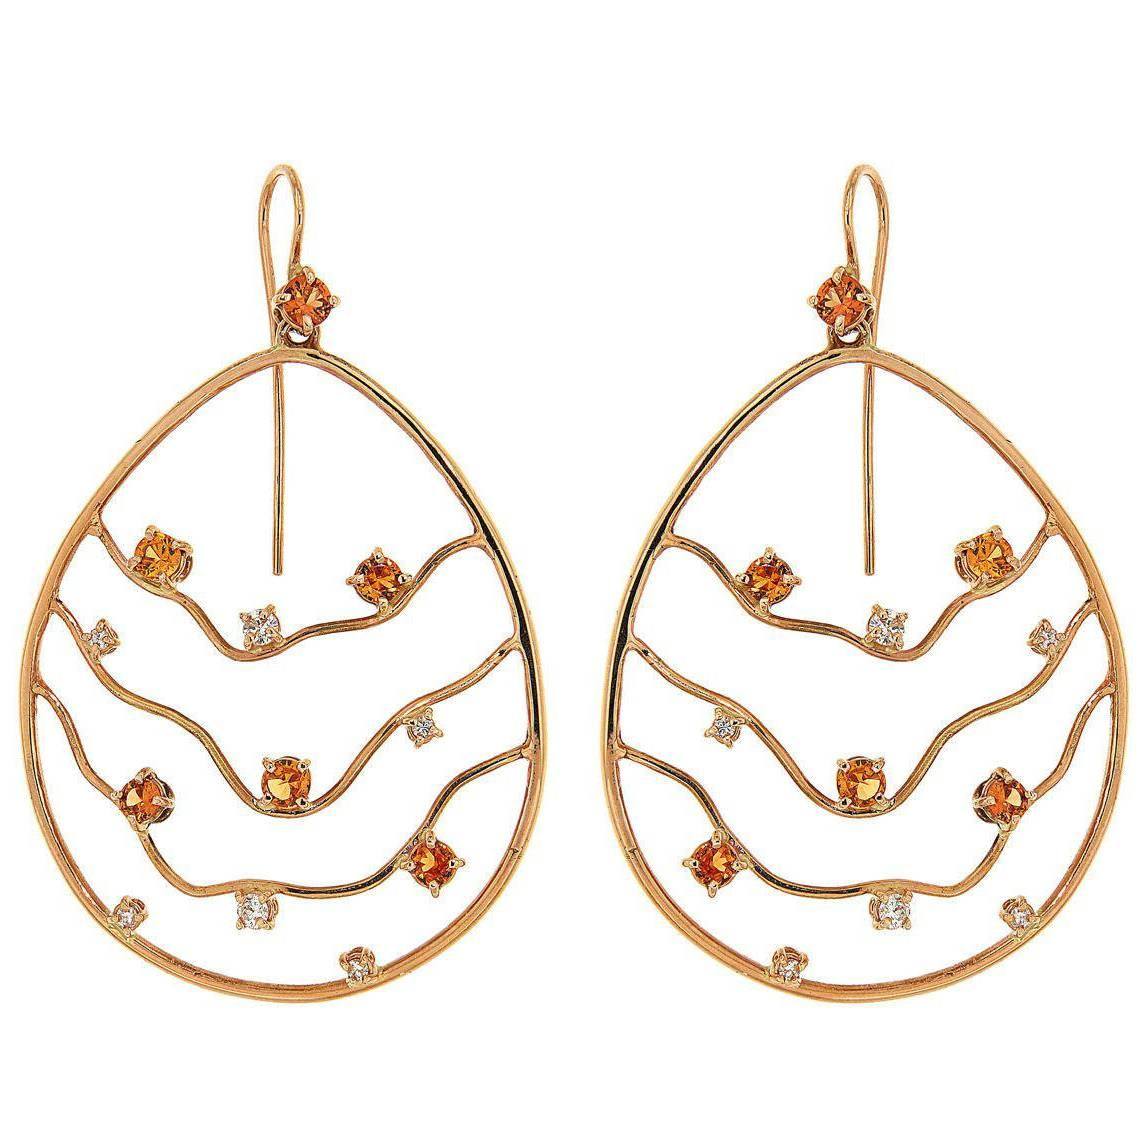 Orange Sapphires Diamonds 18K Rose Gold Earrings Made In Italy By Botta Gioielli